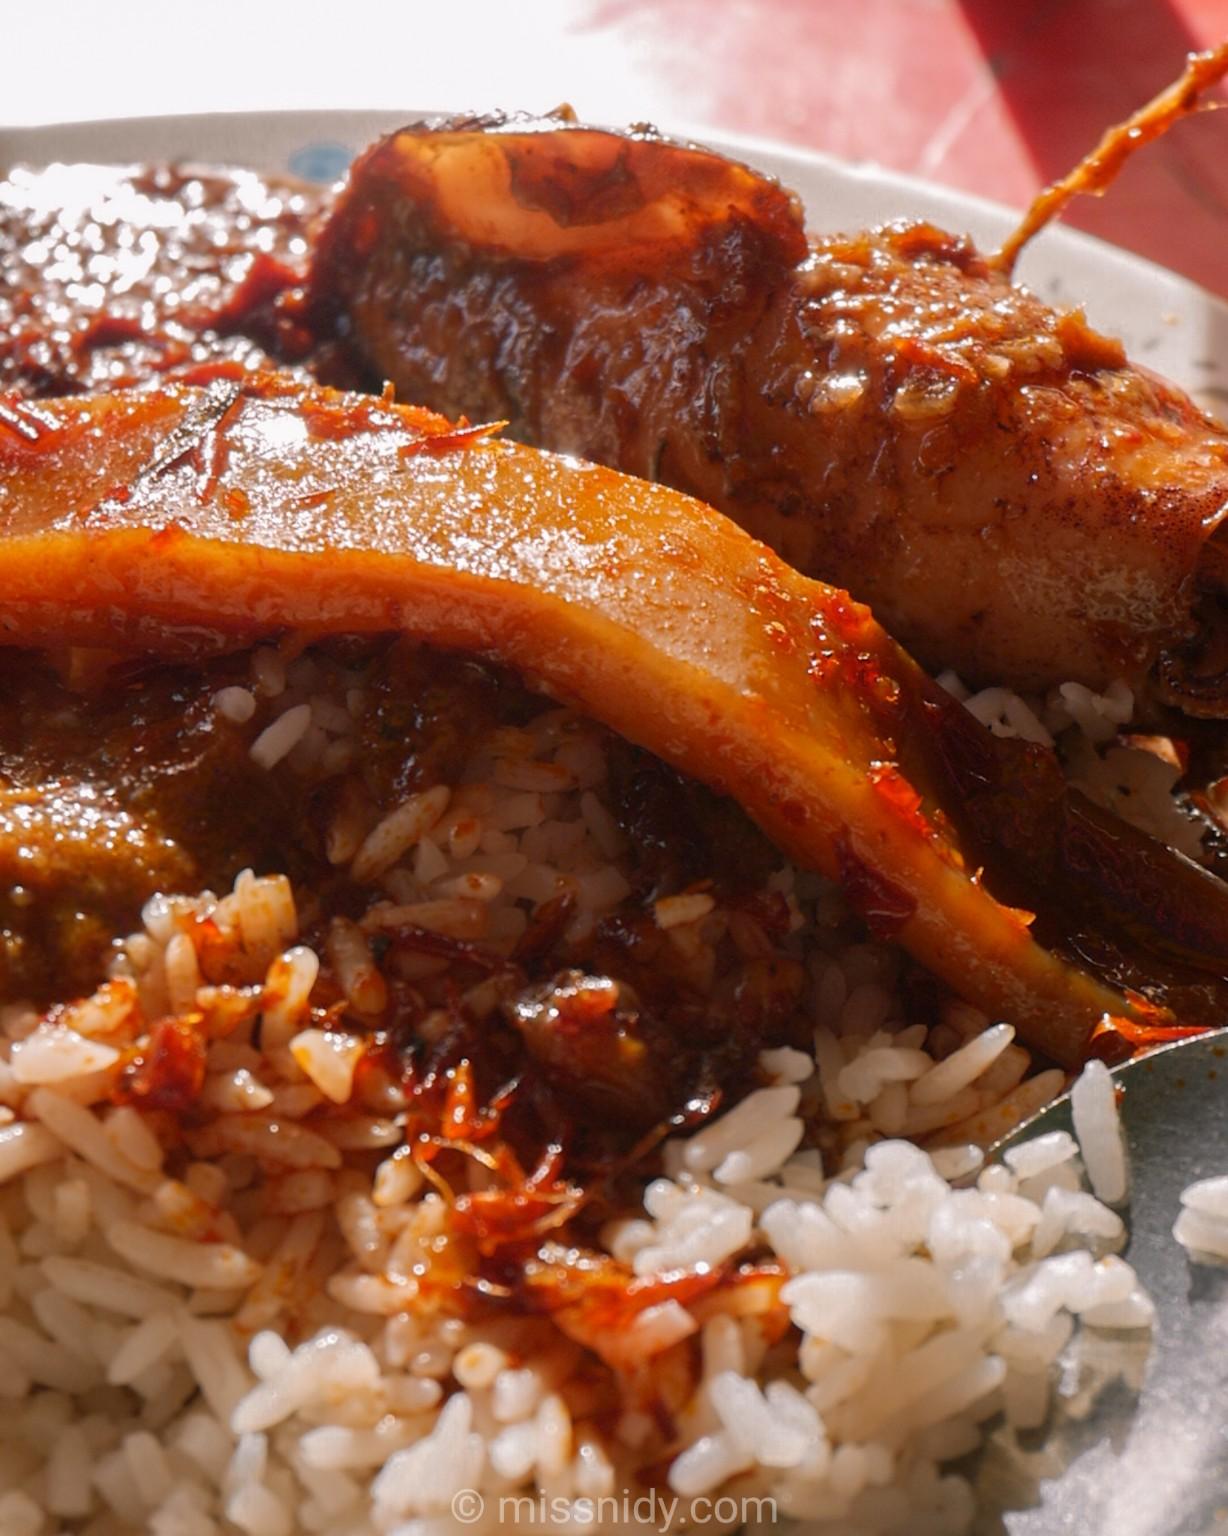 harga menu ra nasi lemak kampung baru kuala lumpur